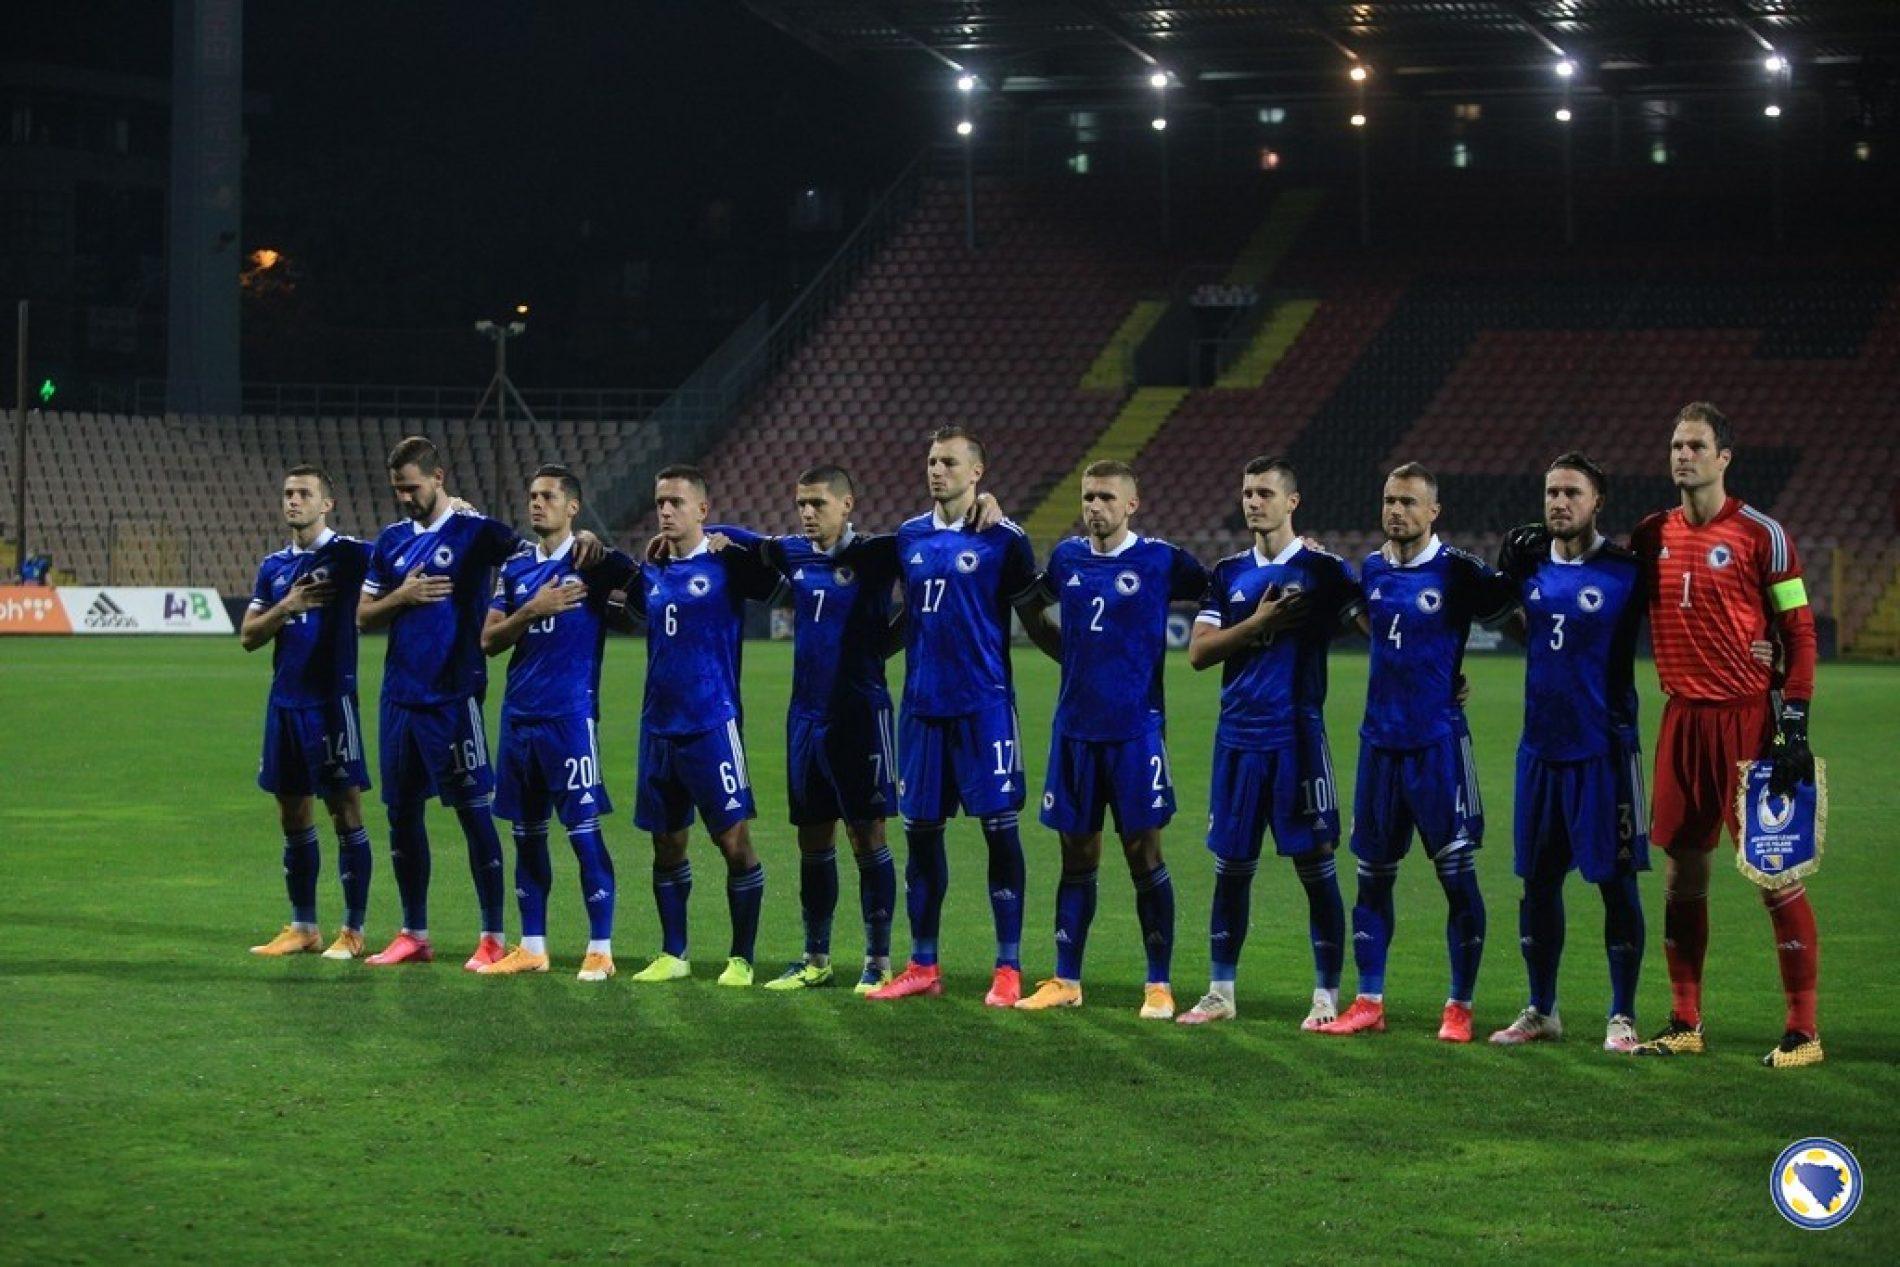 Liga nacija: Zmajevi poveli, pa izgubili od Poljaka